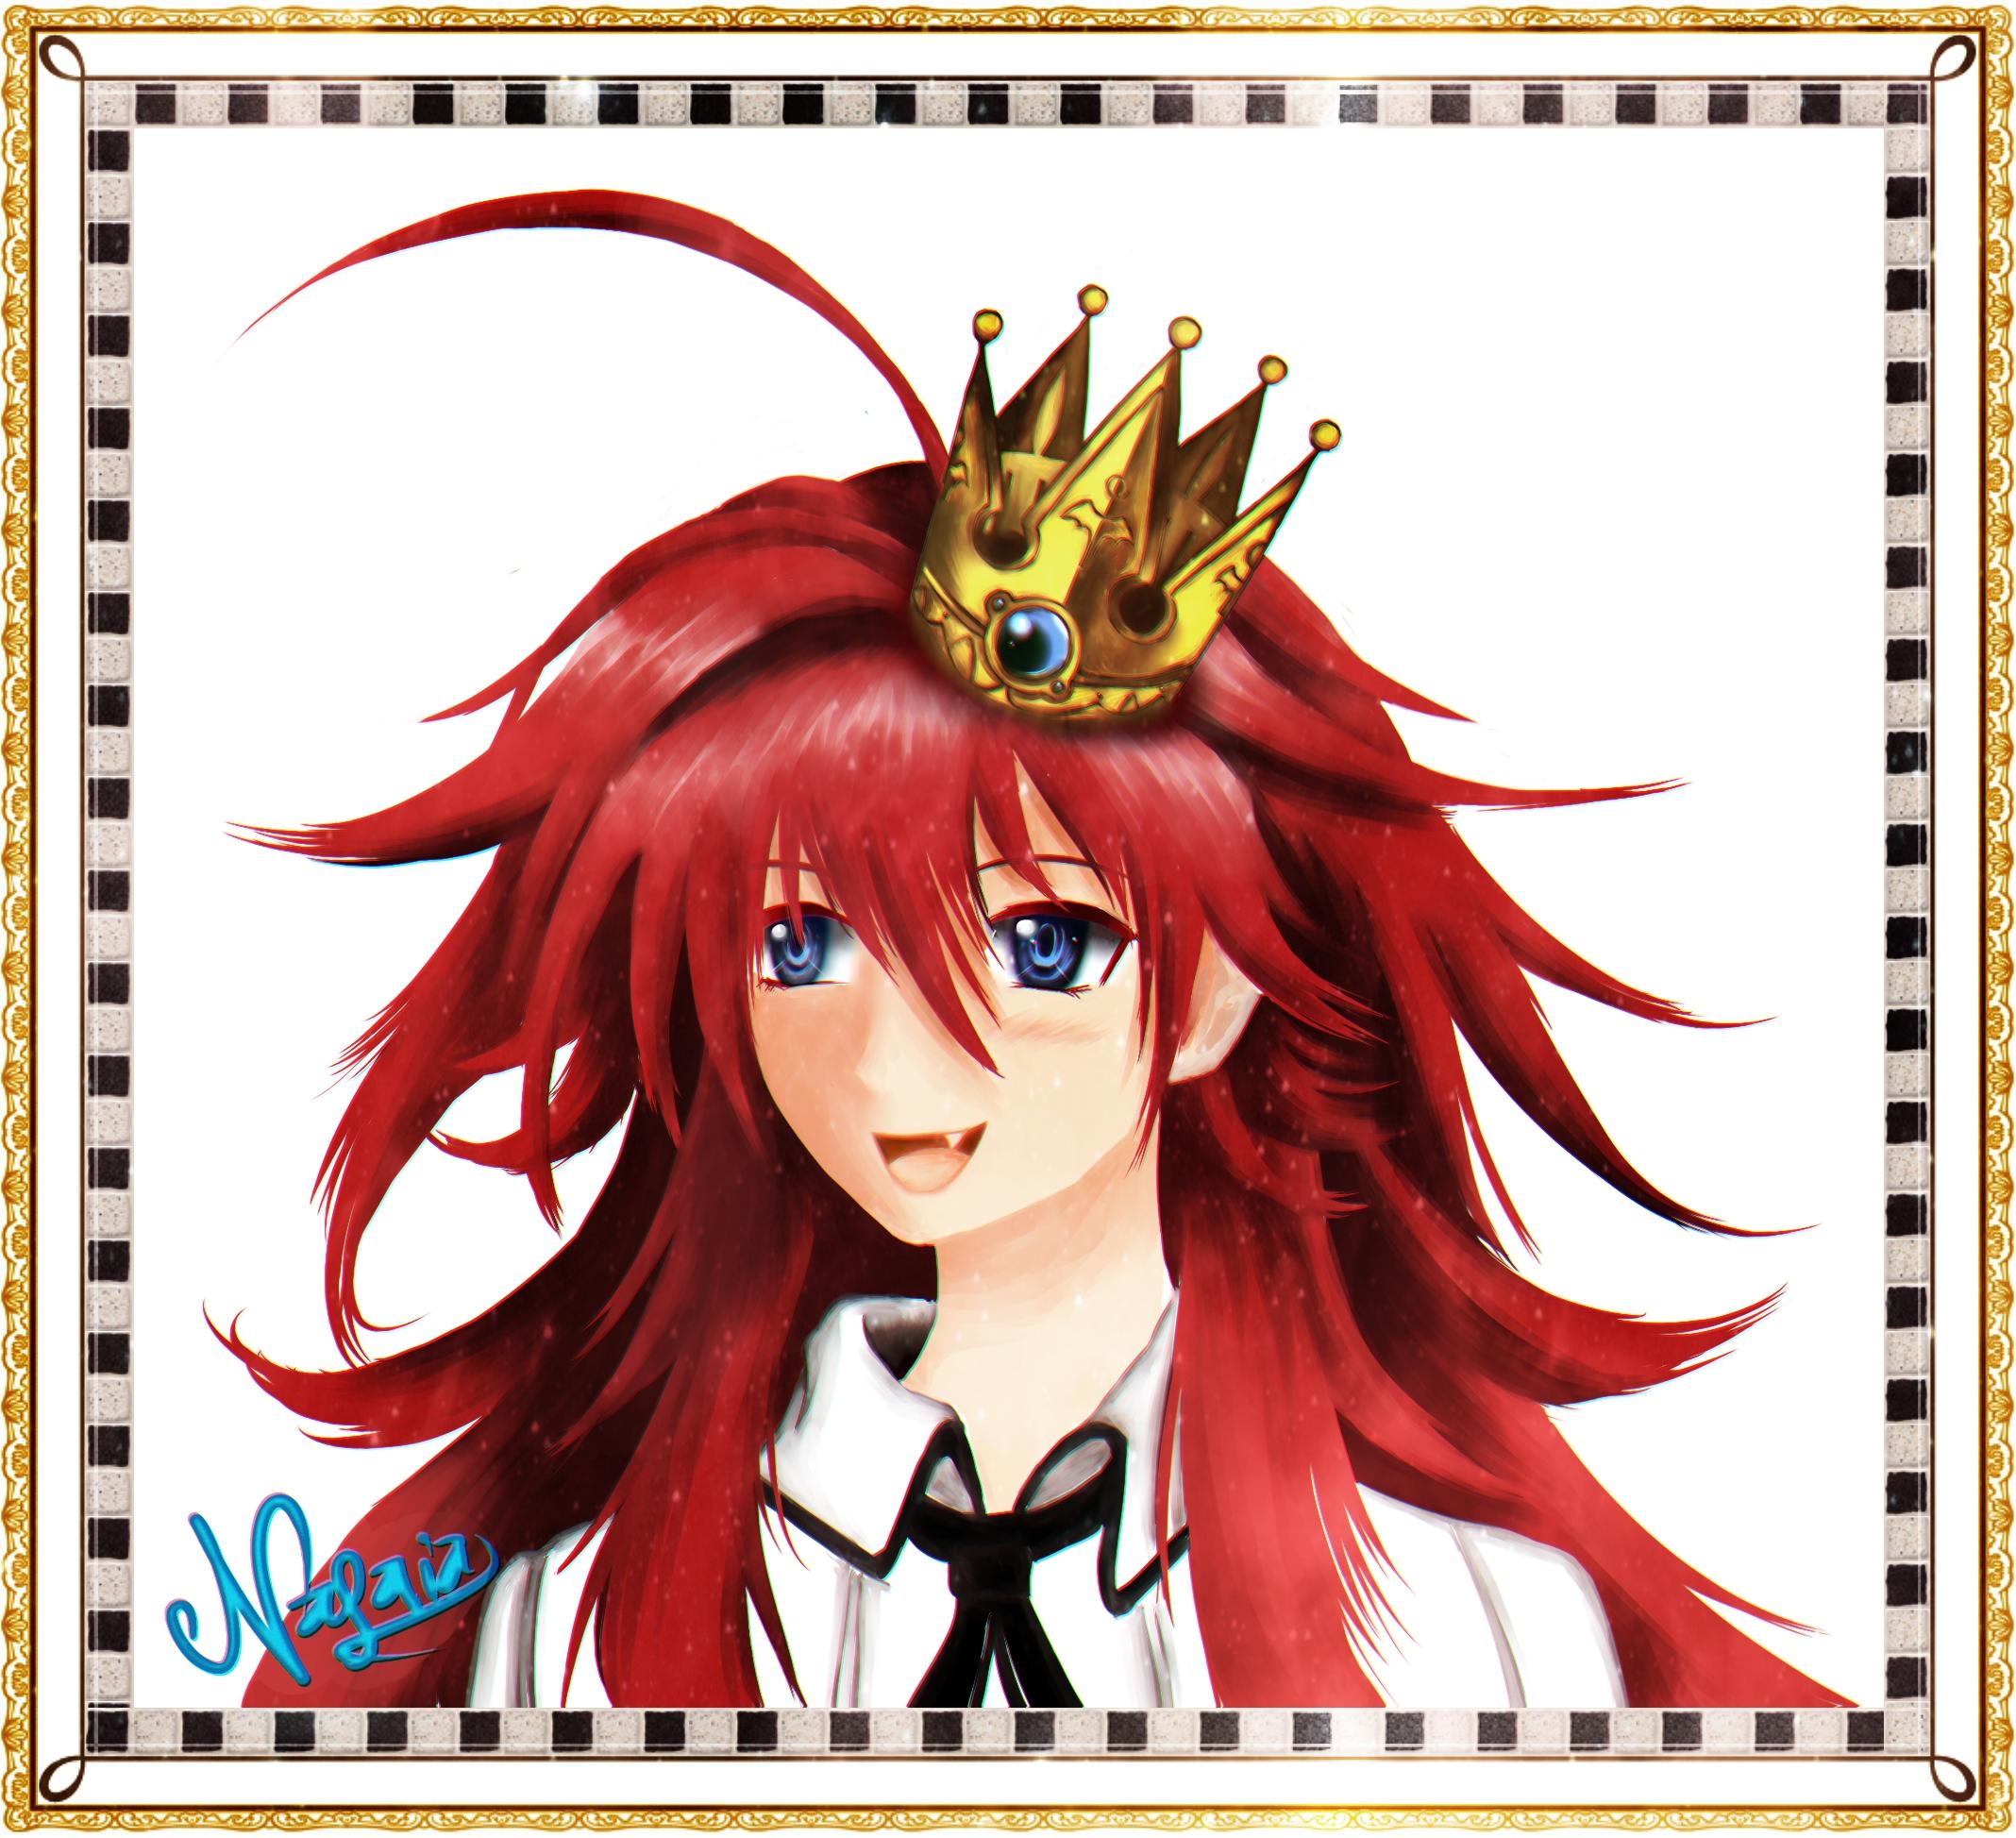 Rias Gremory - Highschool DxD - Zerochan Anime Image Board